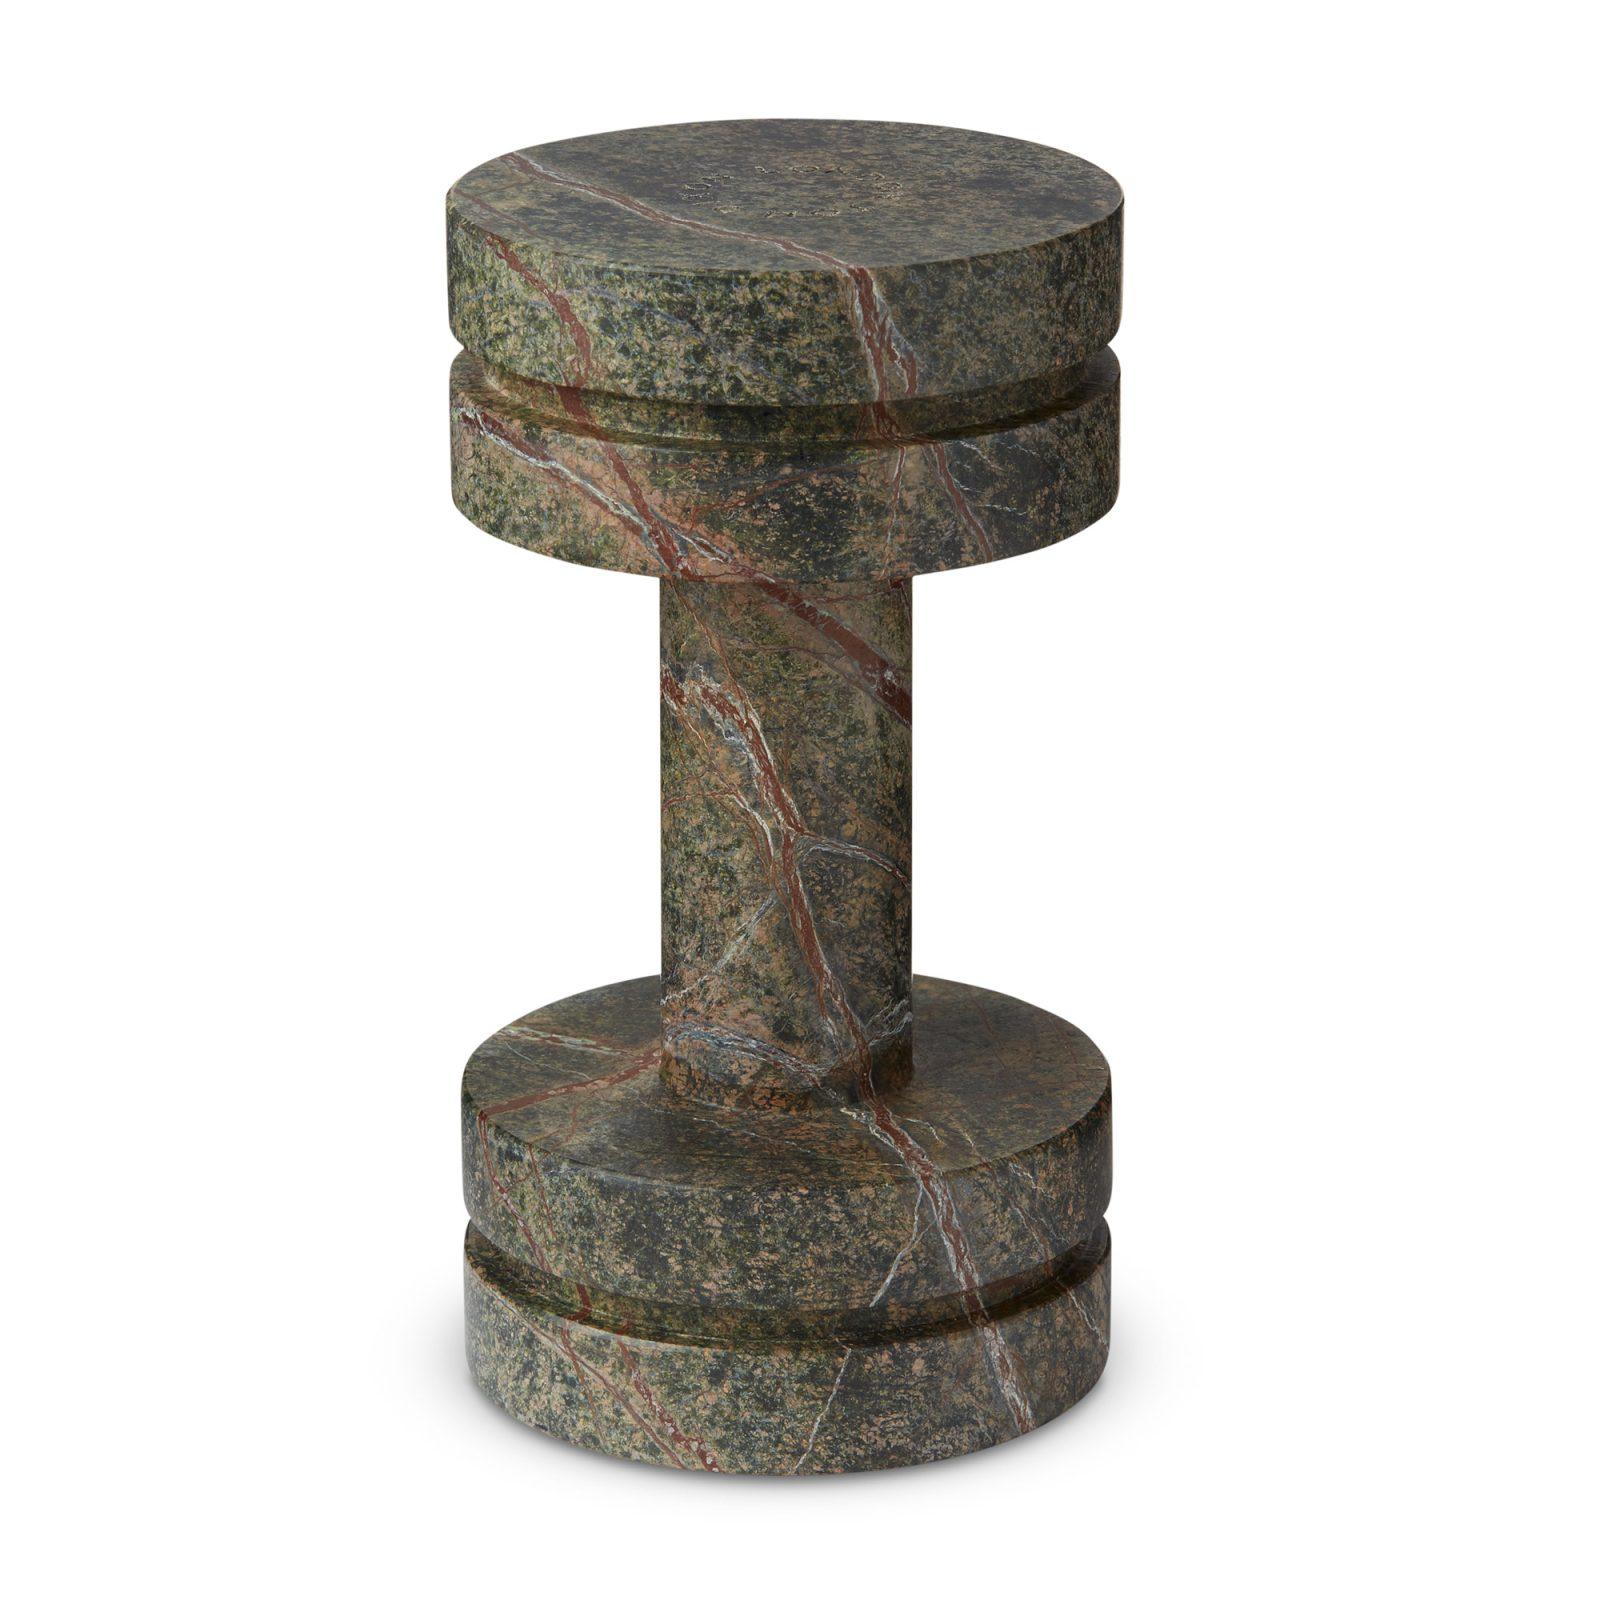 rock-weight-2-5kg-2